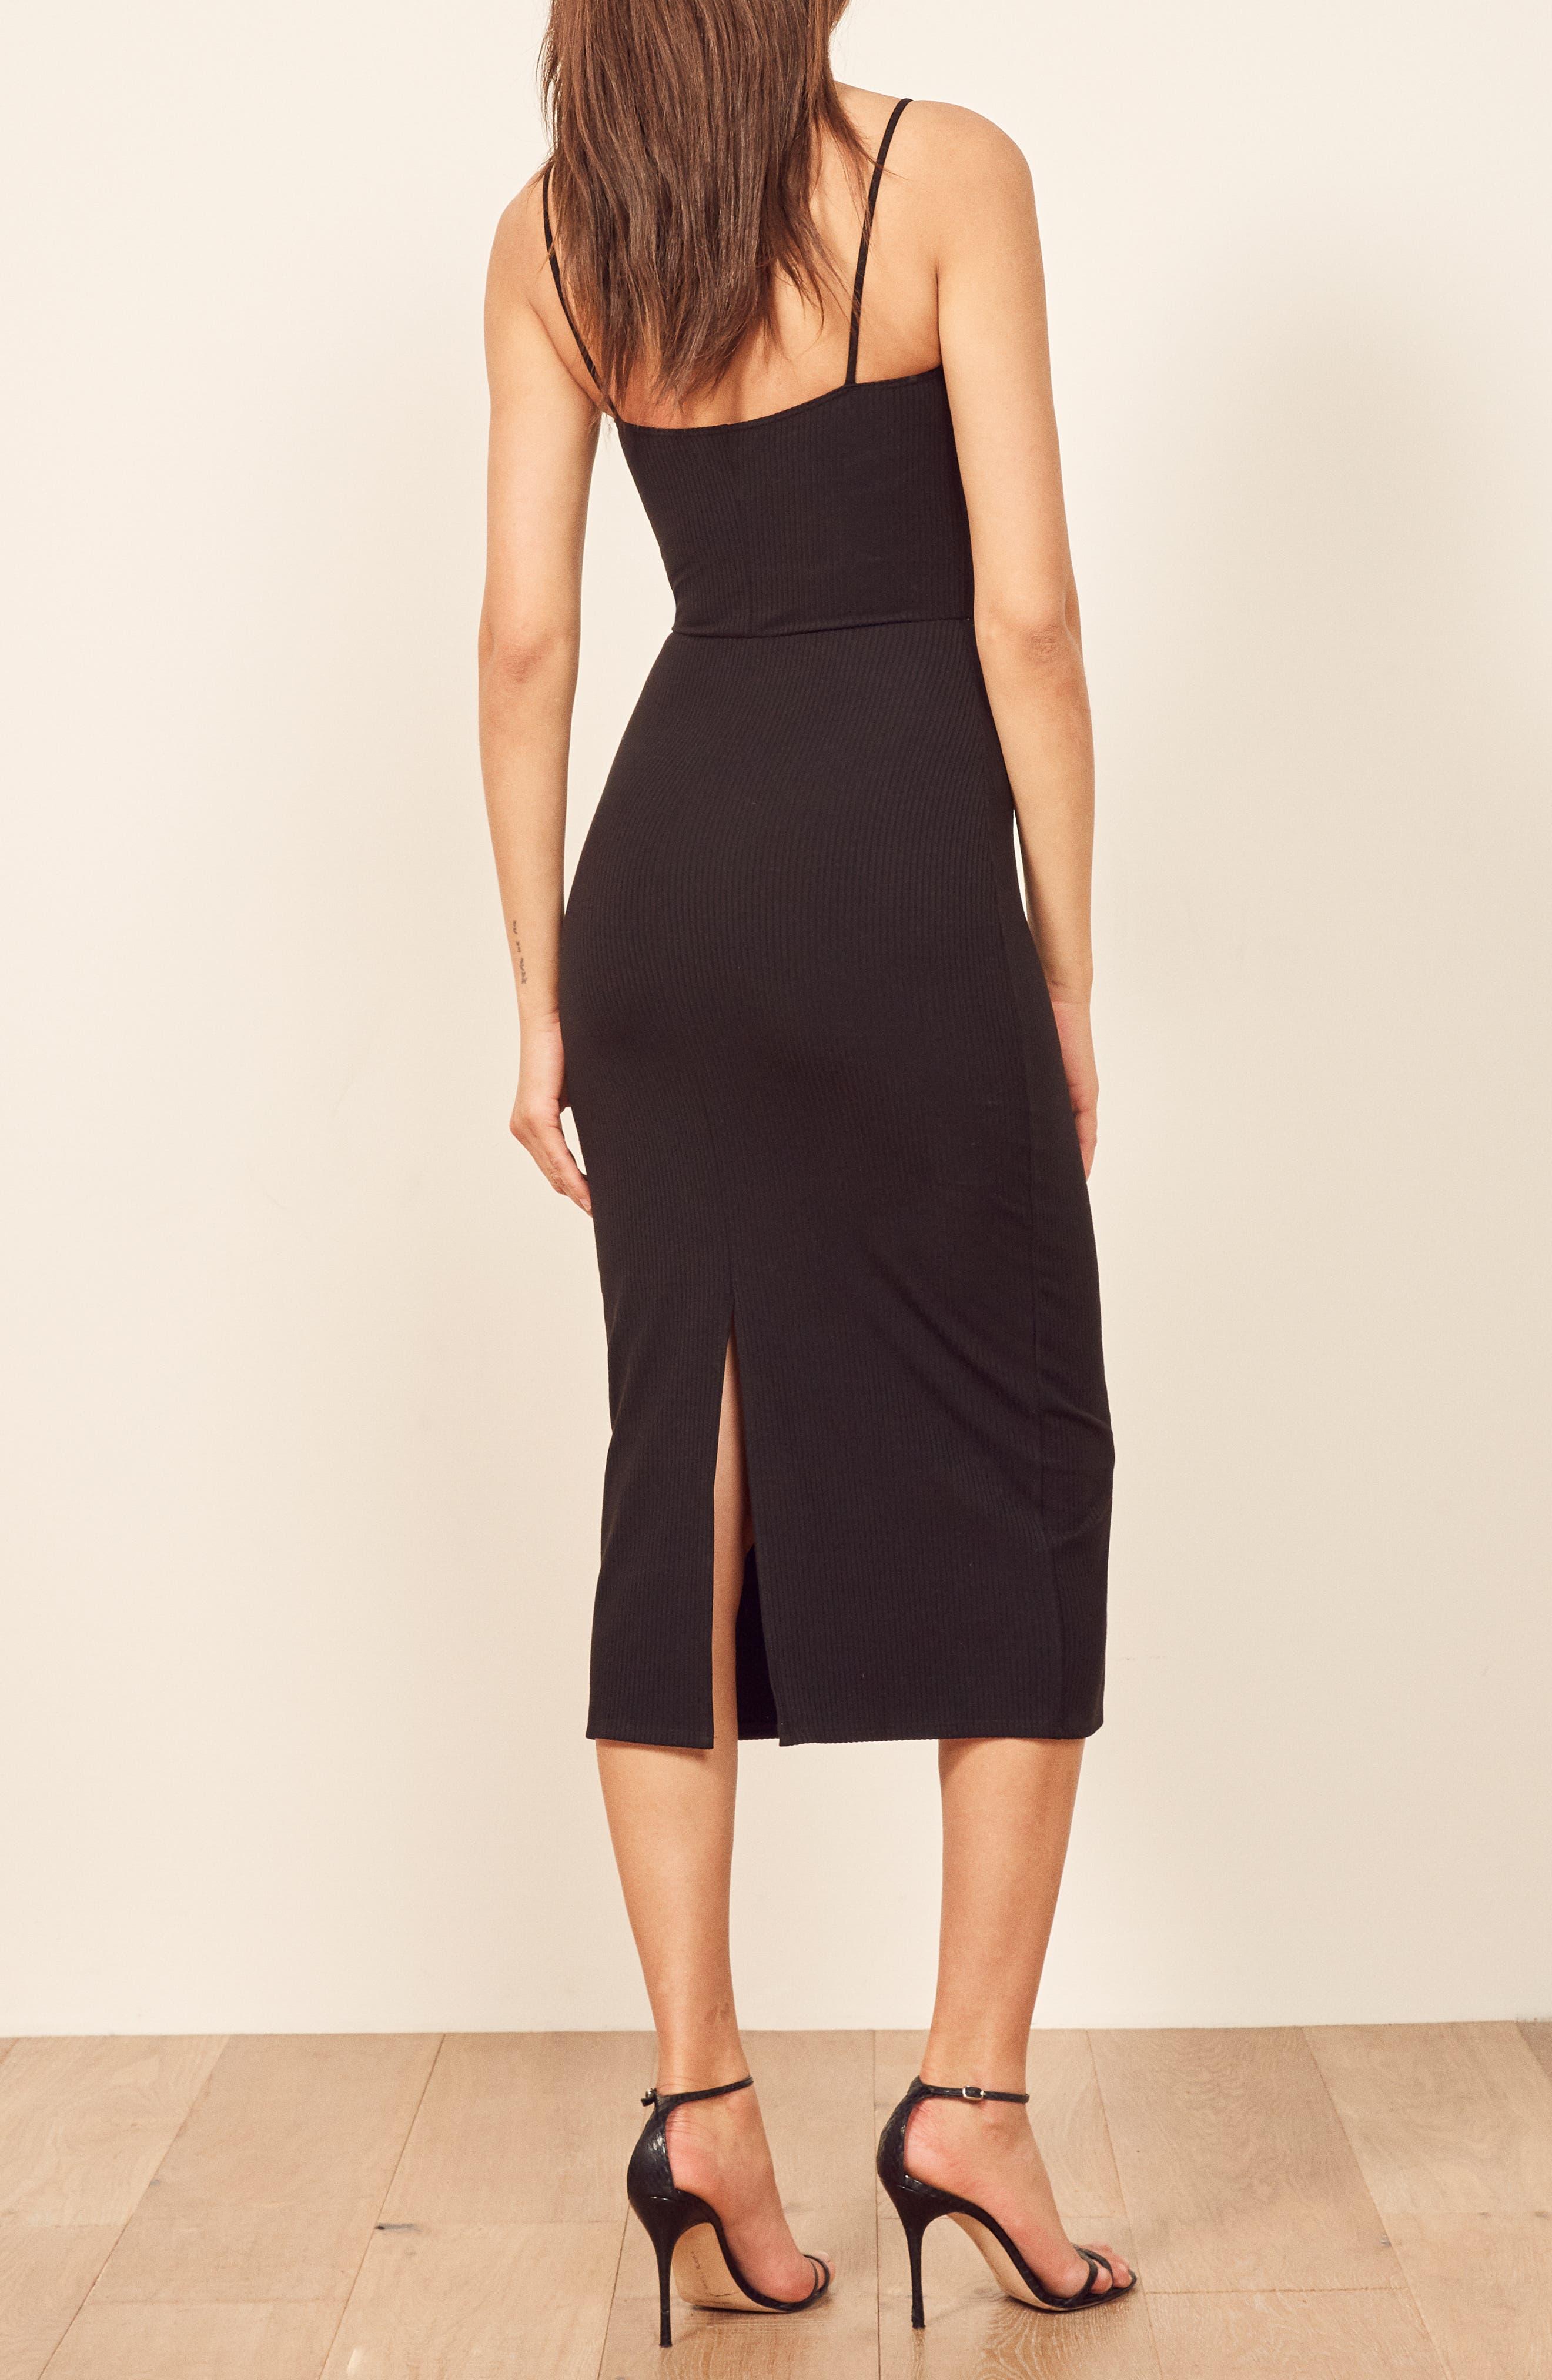 REFORMATION, Haley Midi Dress, Alternate thumbnail 4, color, BLACK